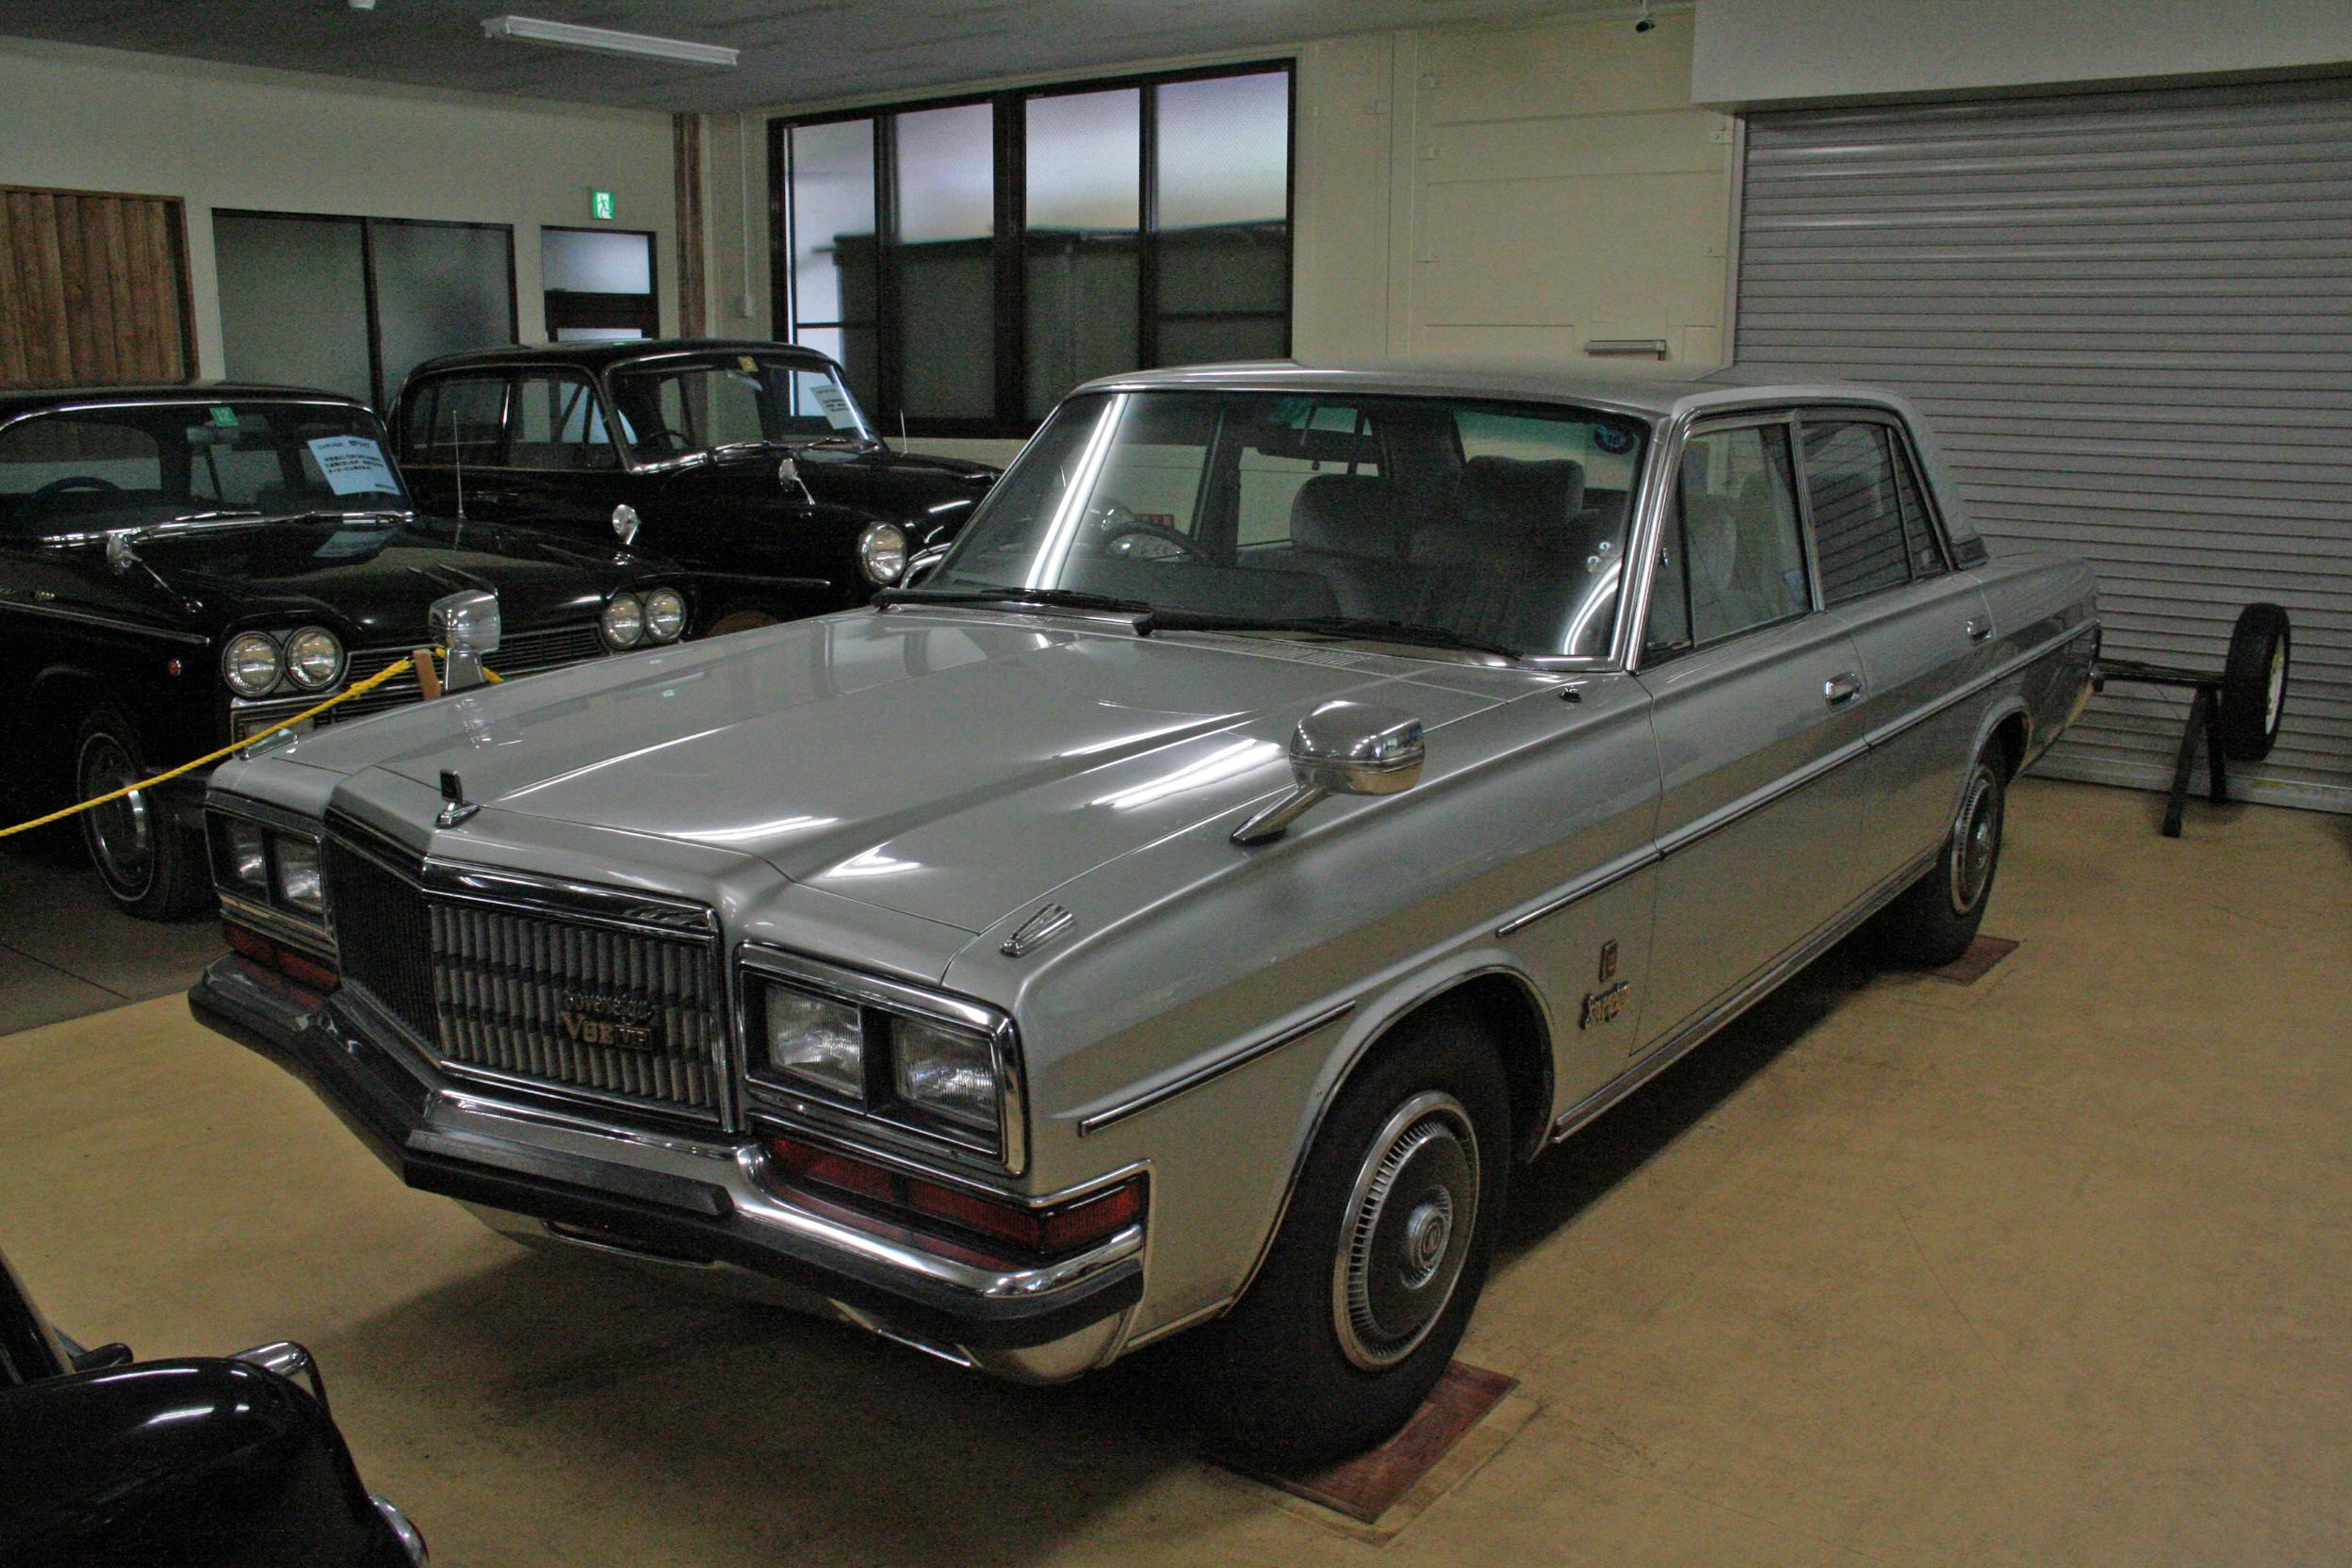 Nissan President I (150, 250) 1965 - 1990 Sedan #2